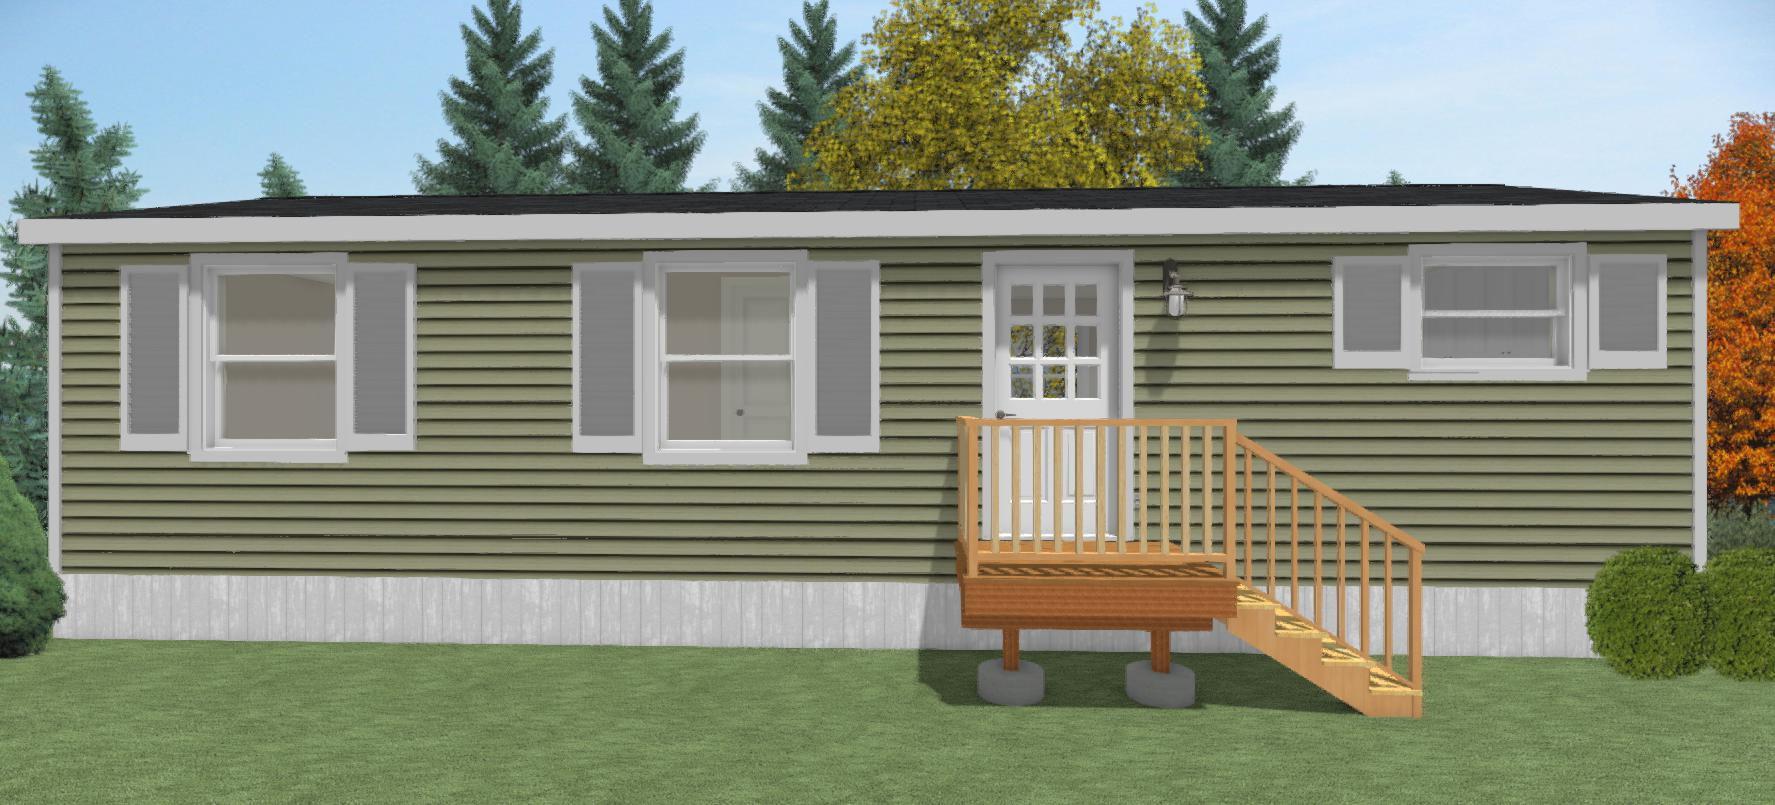 Main Photo: 1501 Mini Home